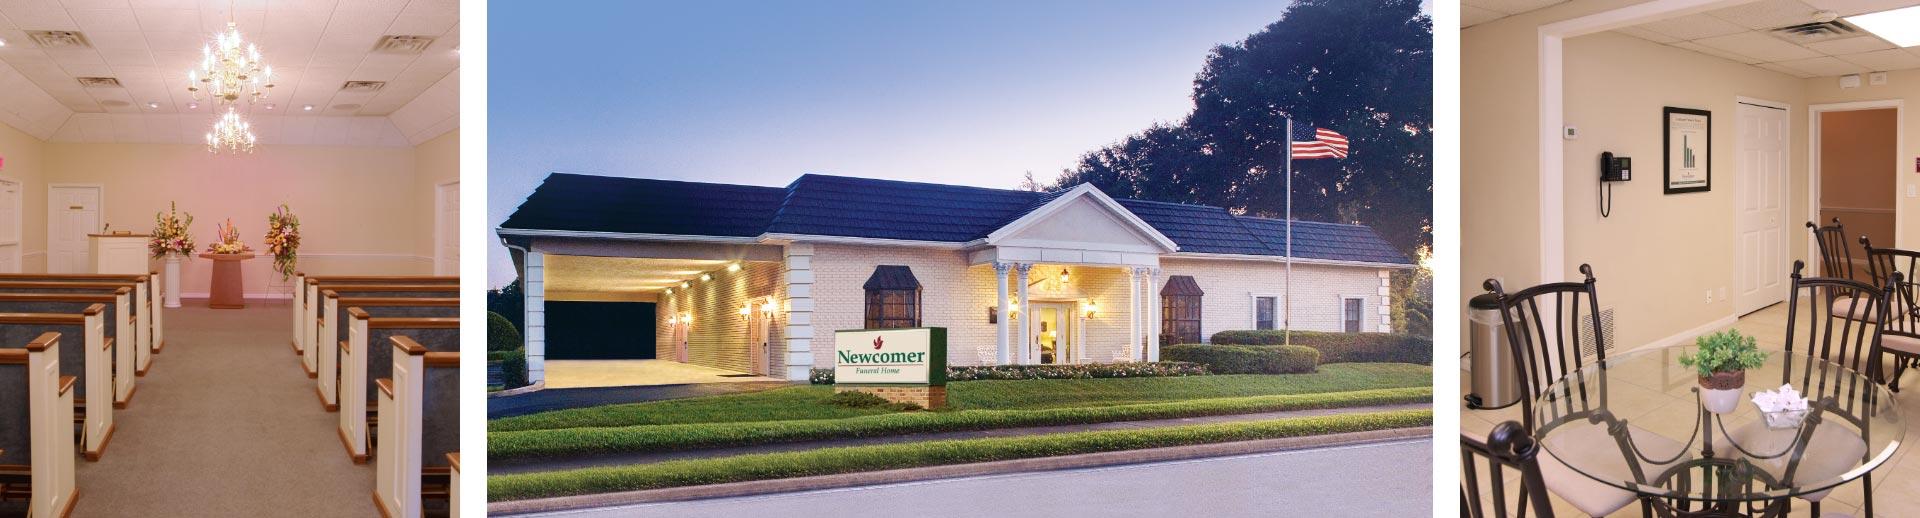 Funeral-Home-Longwood-FL